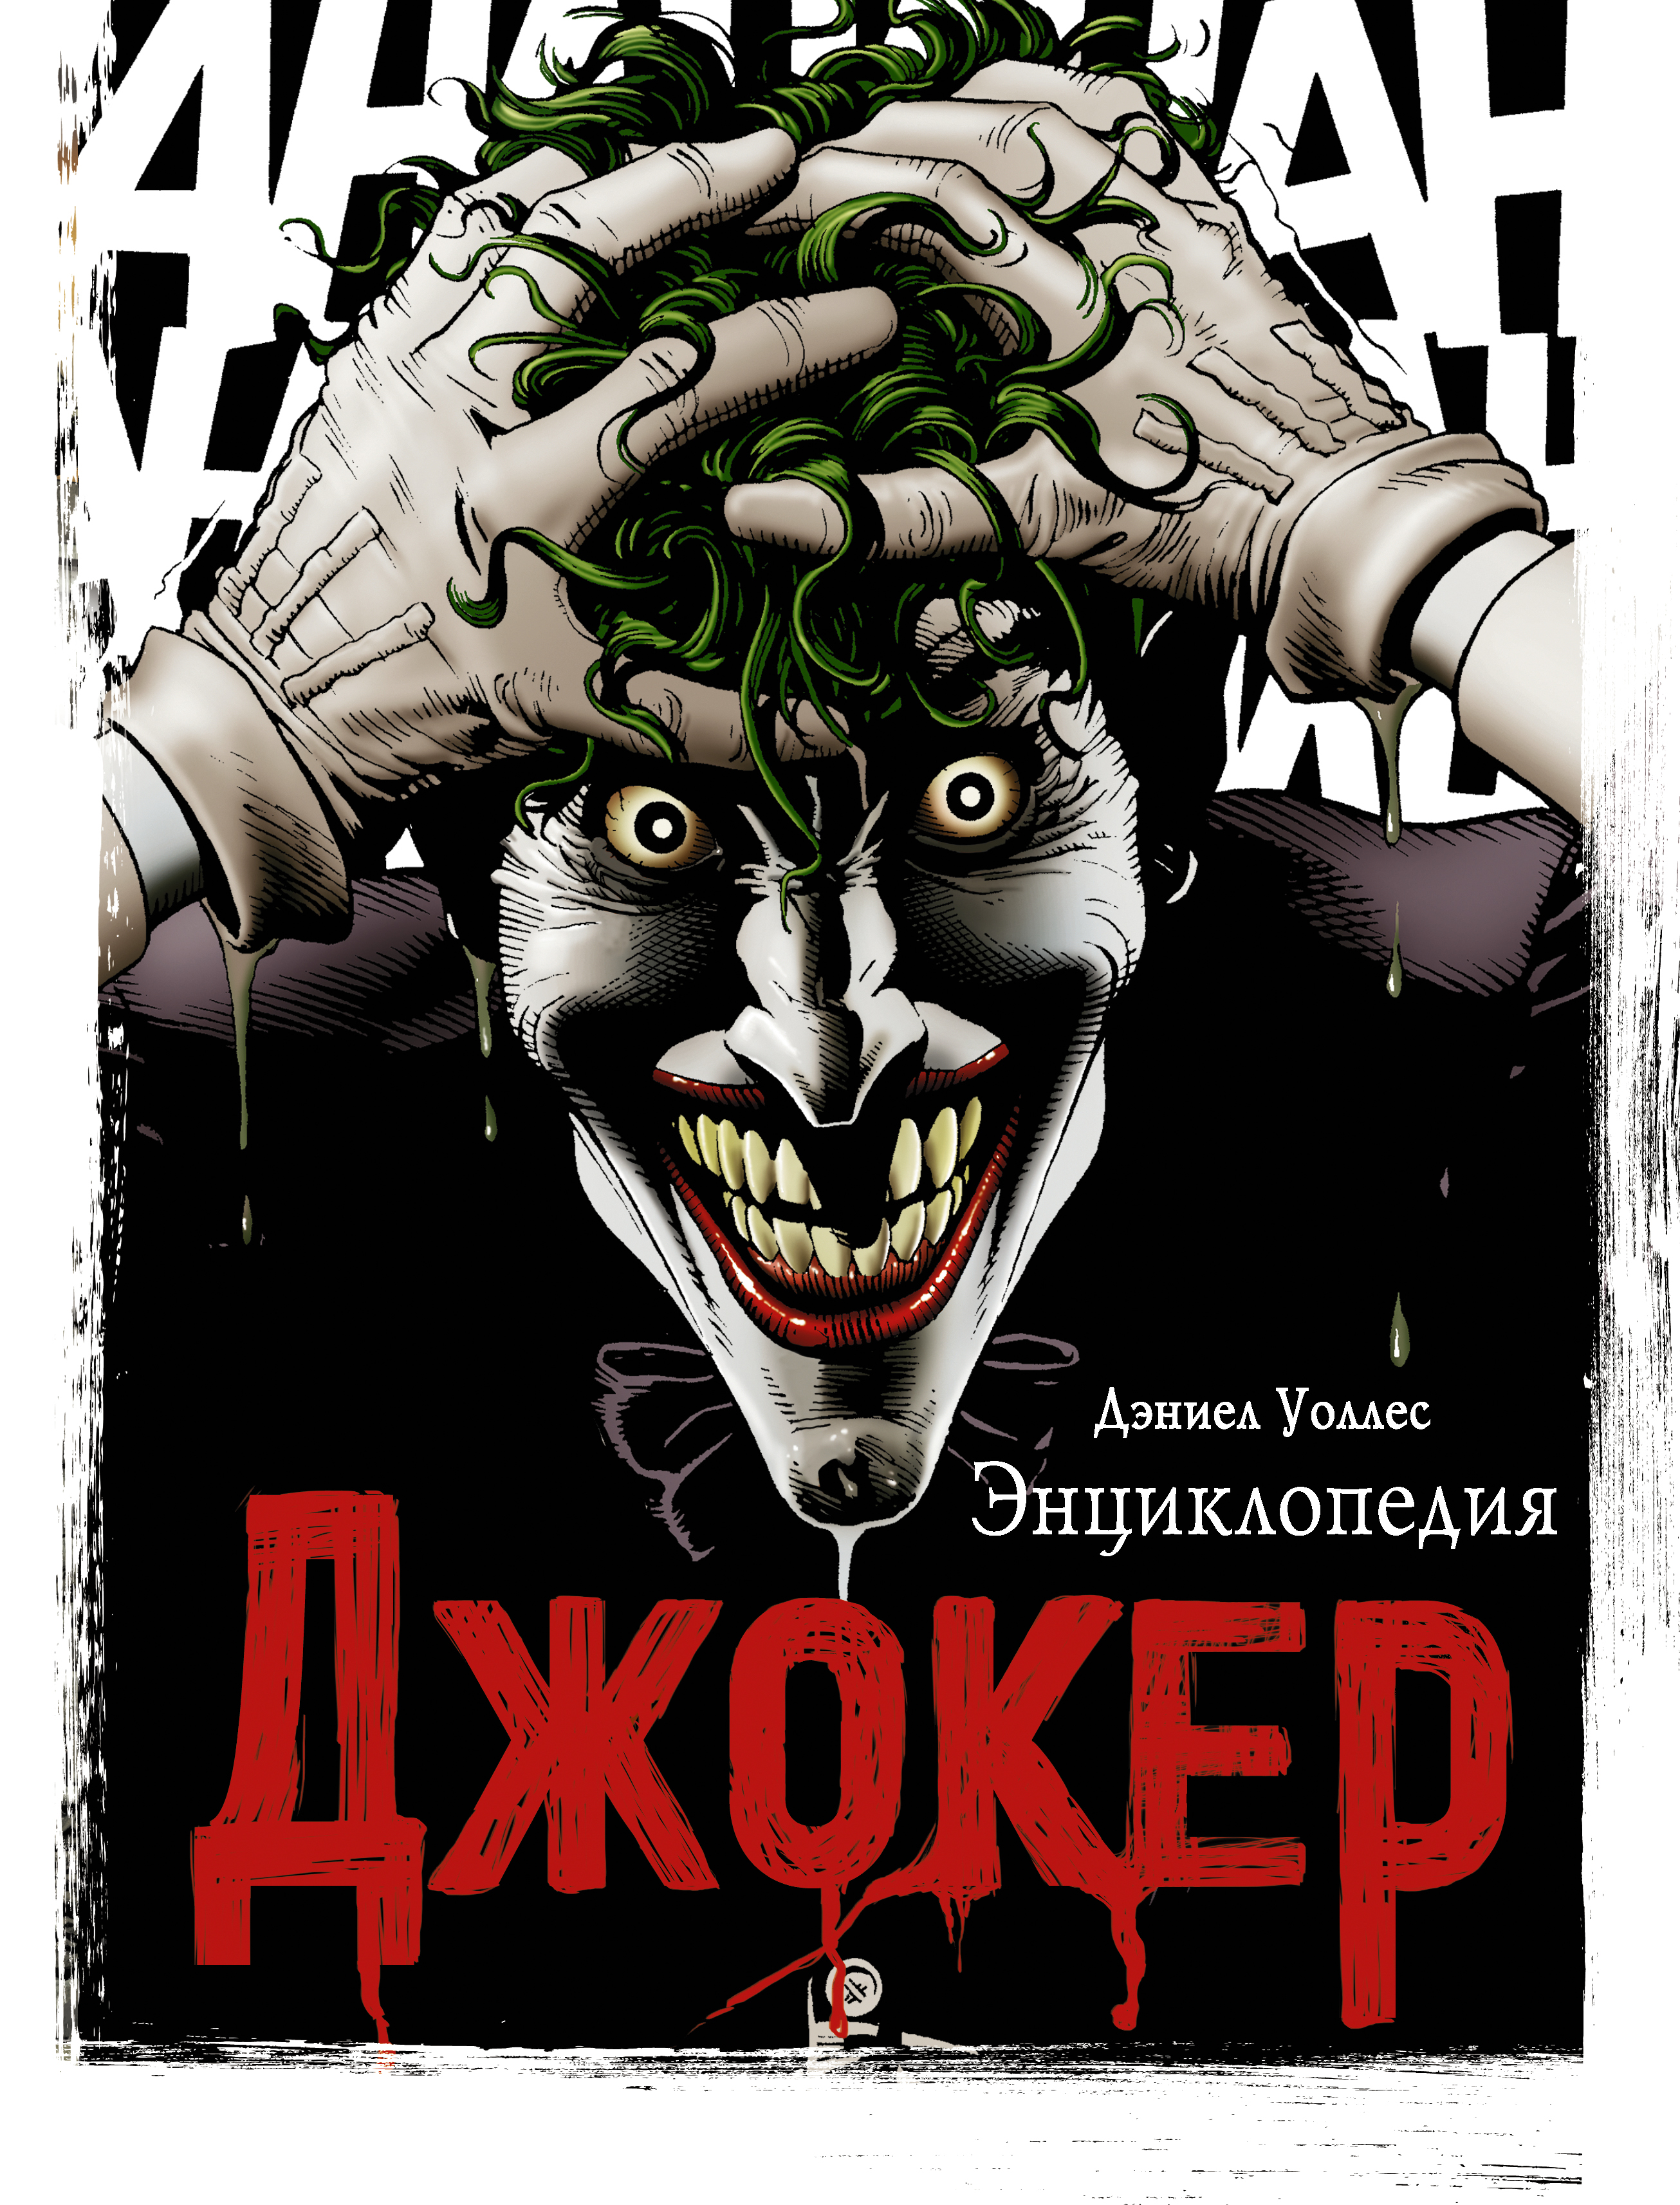 Джокер. Энциклопедия ( Дэниел Уоллес  )